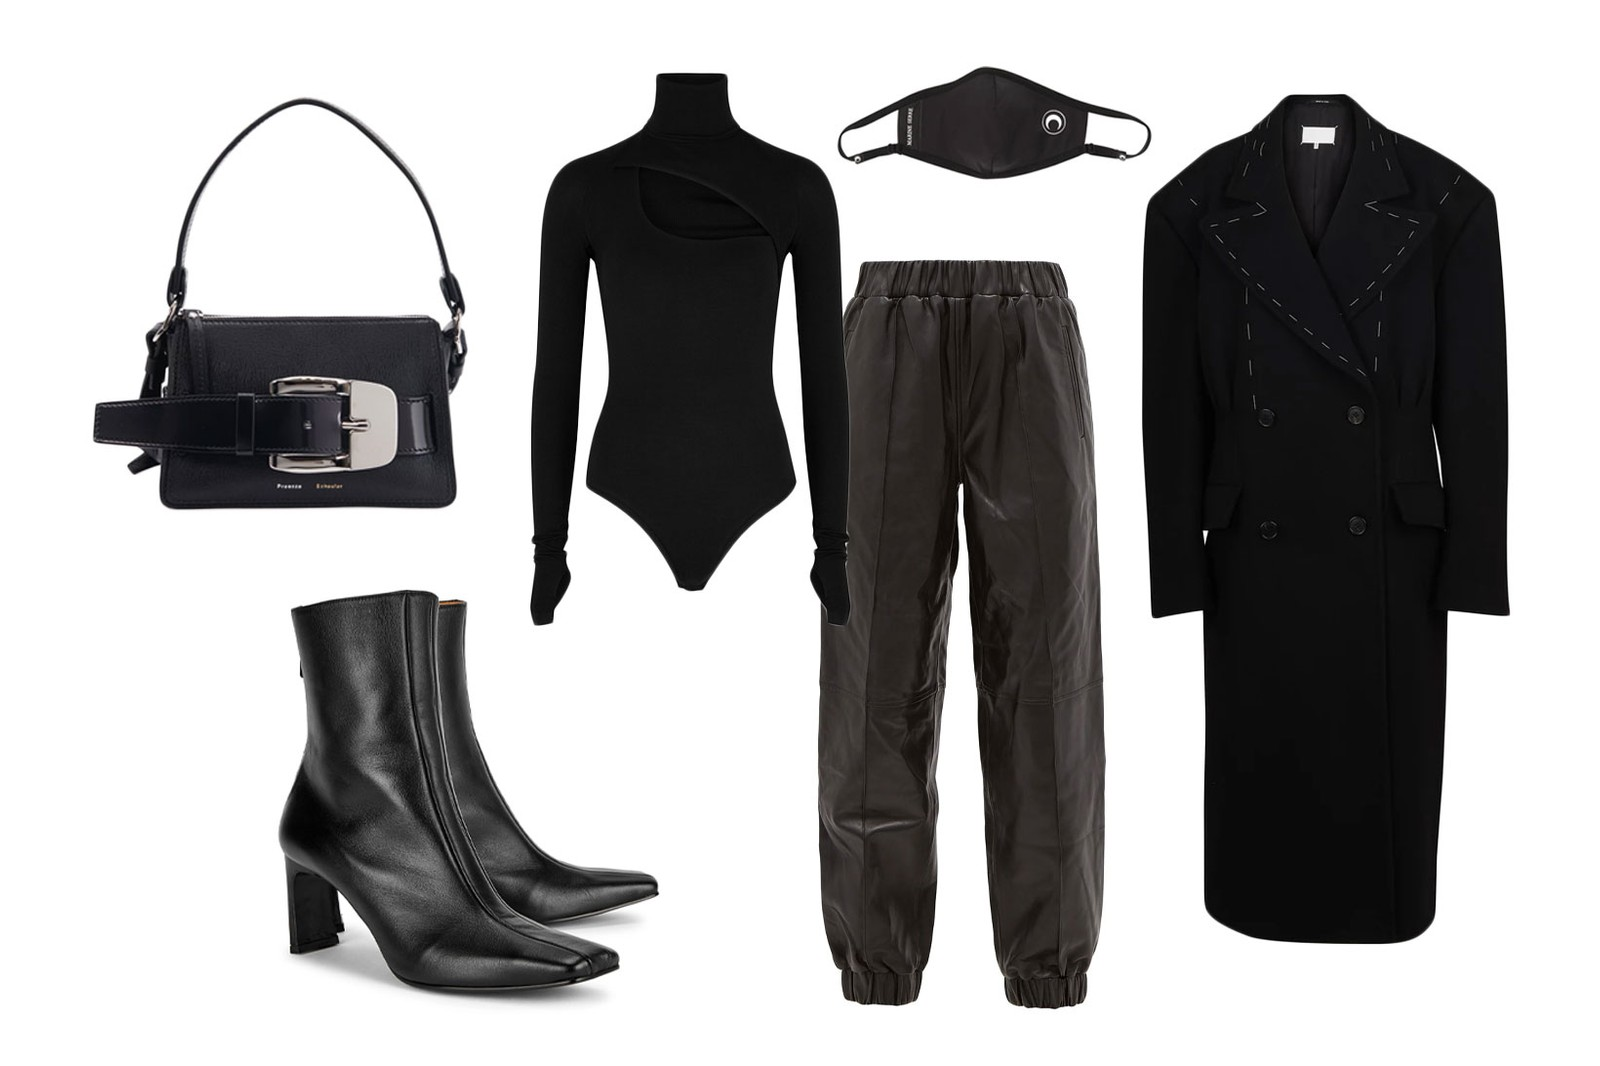 tracksuits styling guide editors outfit all black maison margiela ganni alix marine serre mask reike nen boots